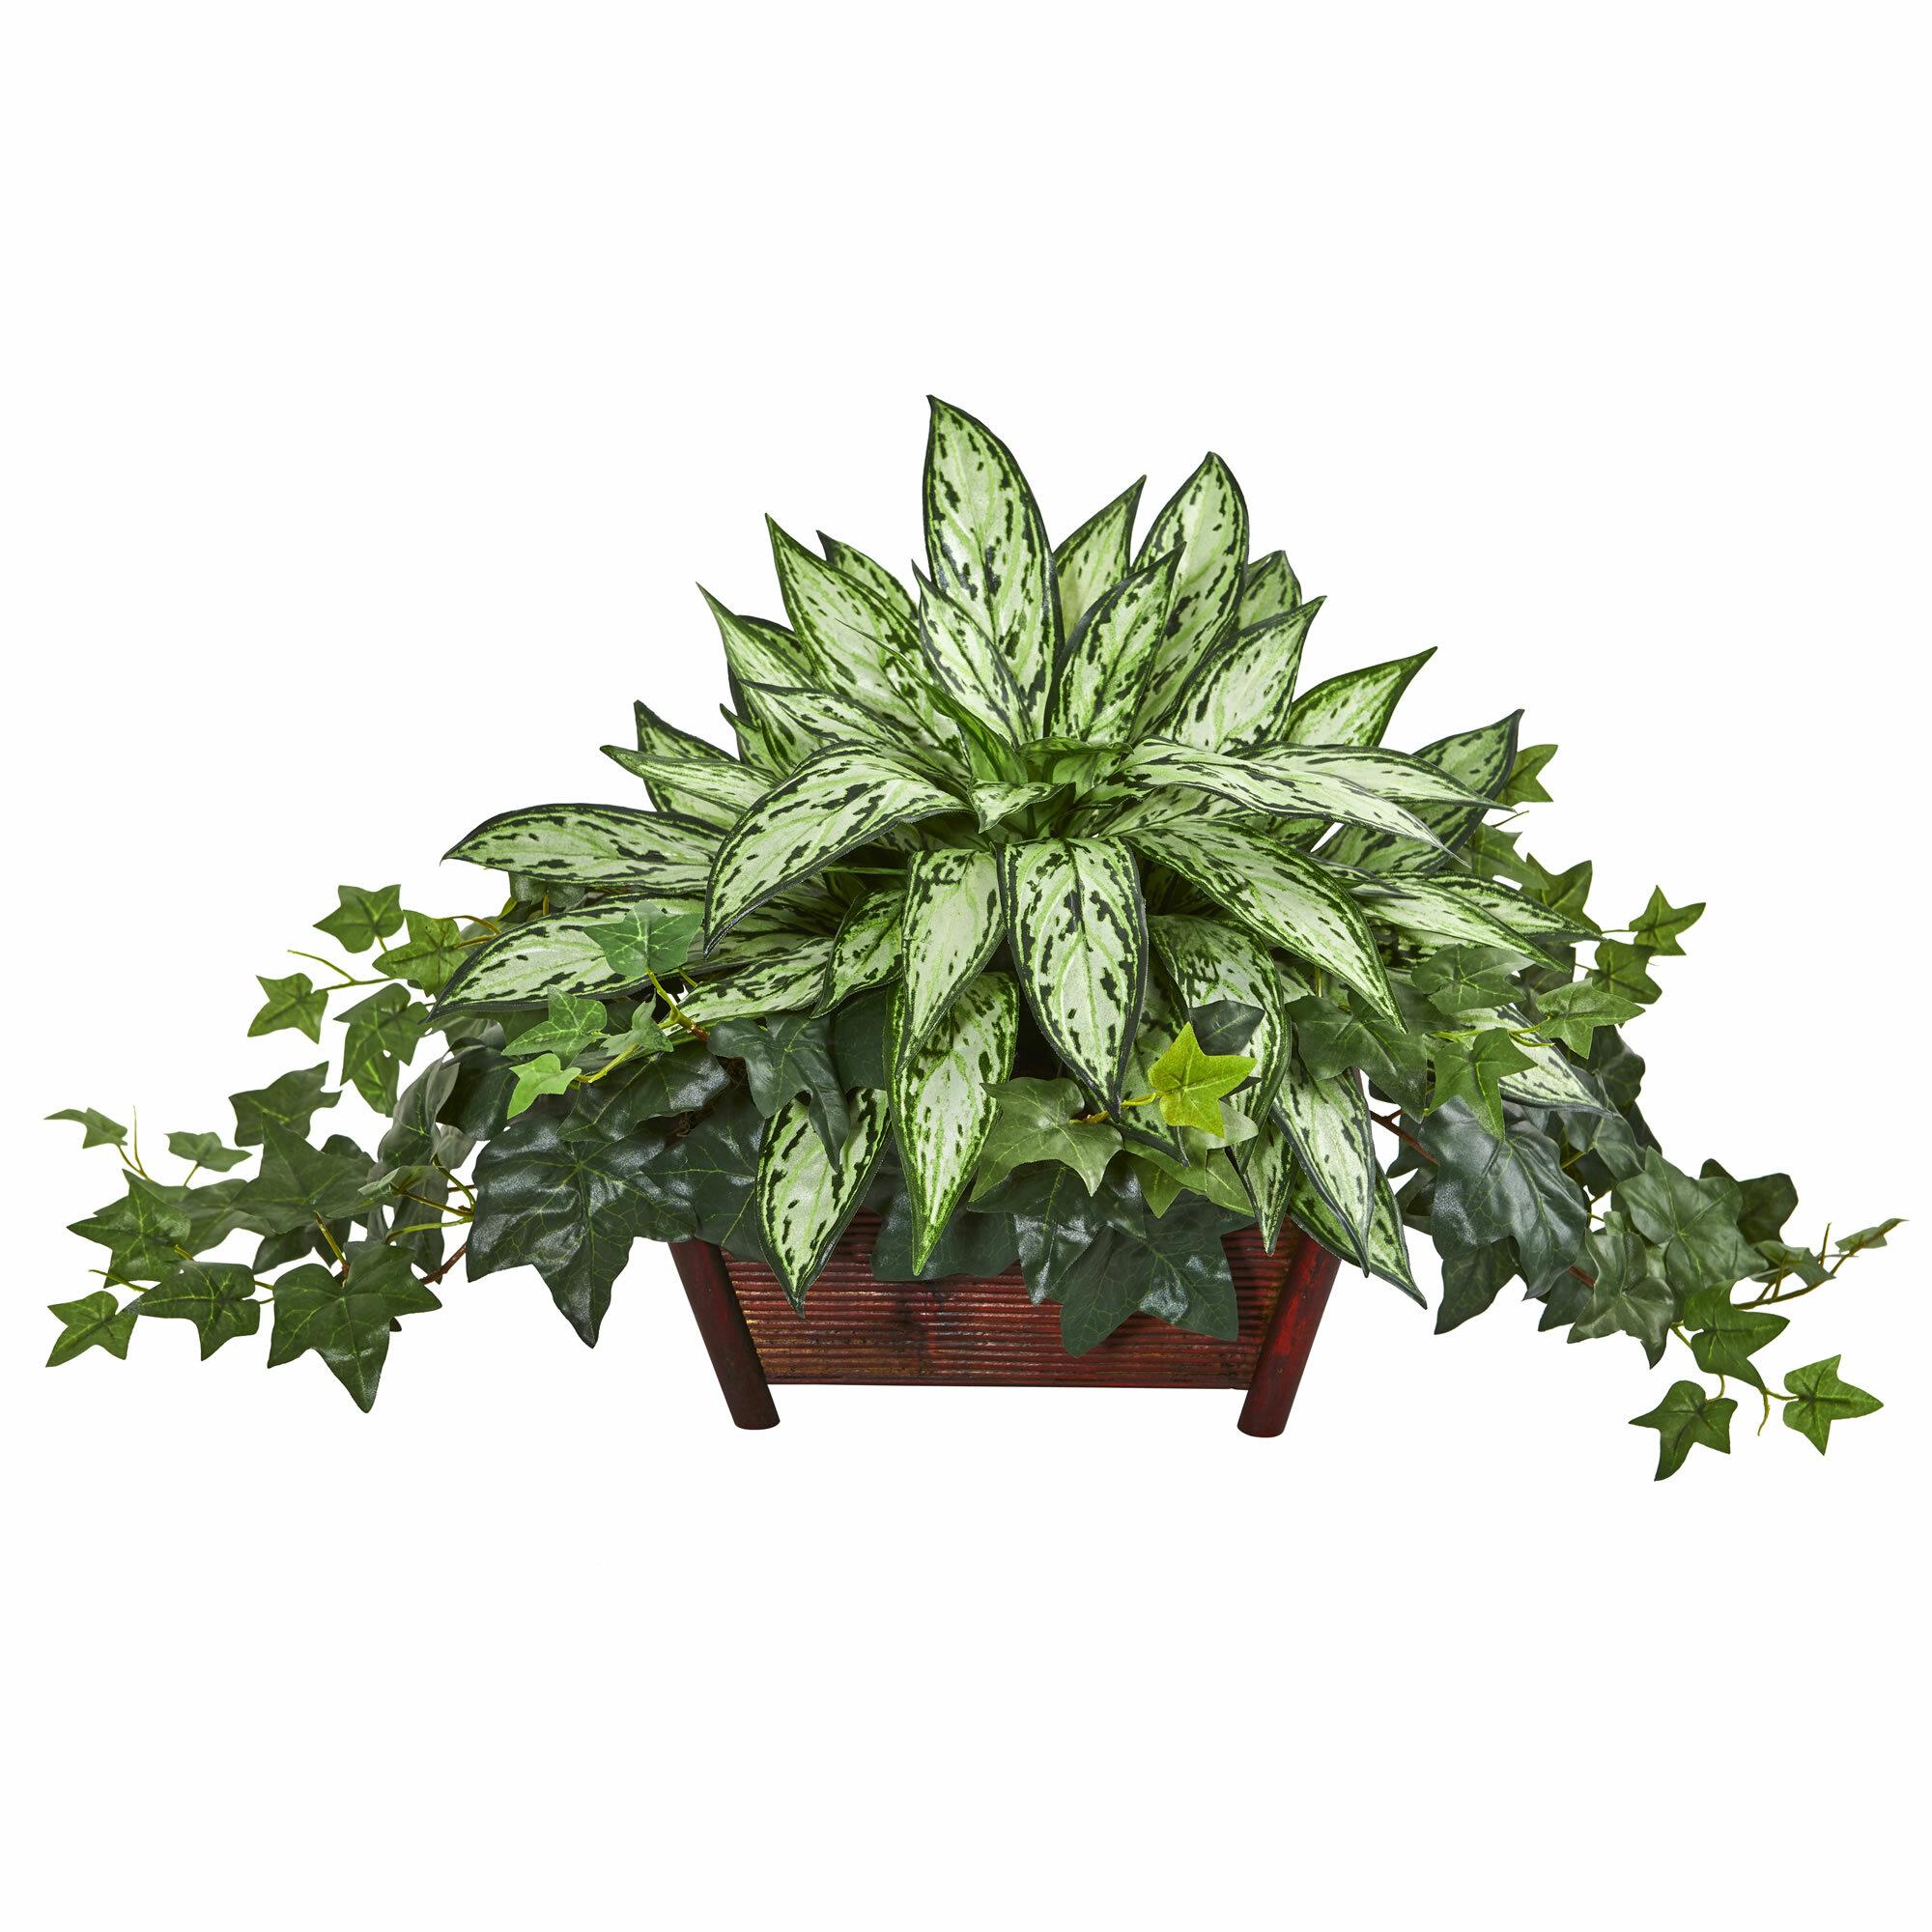 Wrought Studio Artificial Foliage Plant In Basket Reviews Wayfair